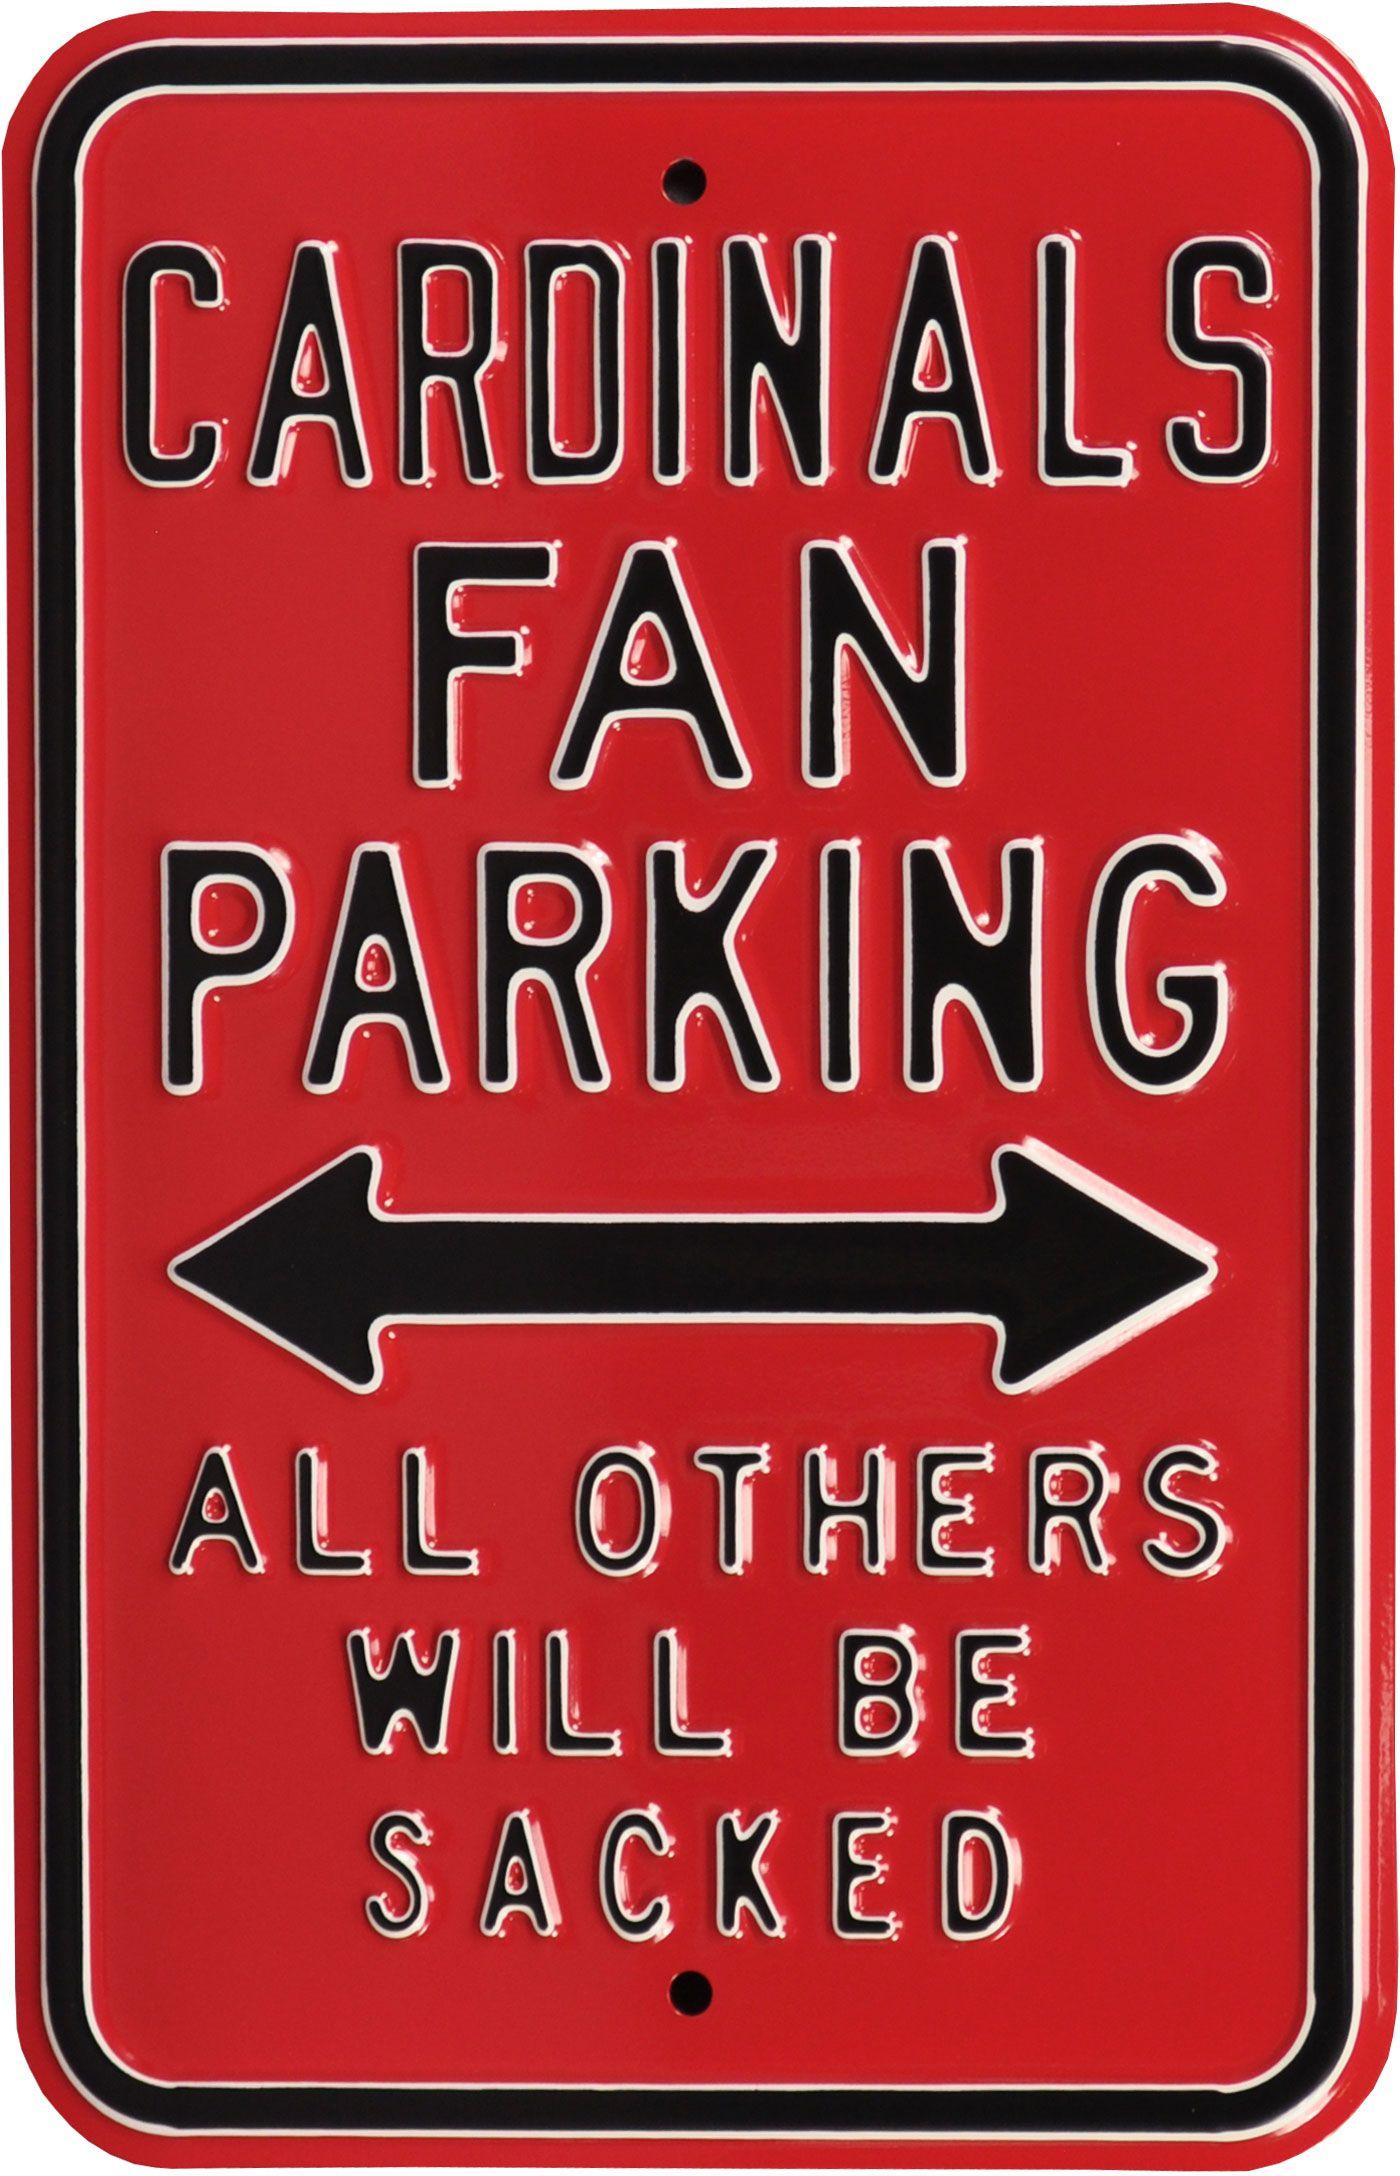 Authentic Street Signs Arizona Cardinals Parking Sign